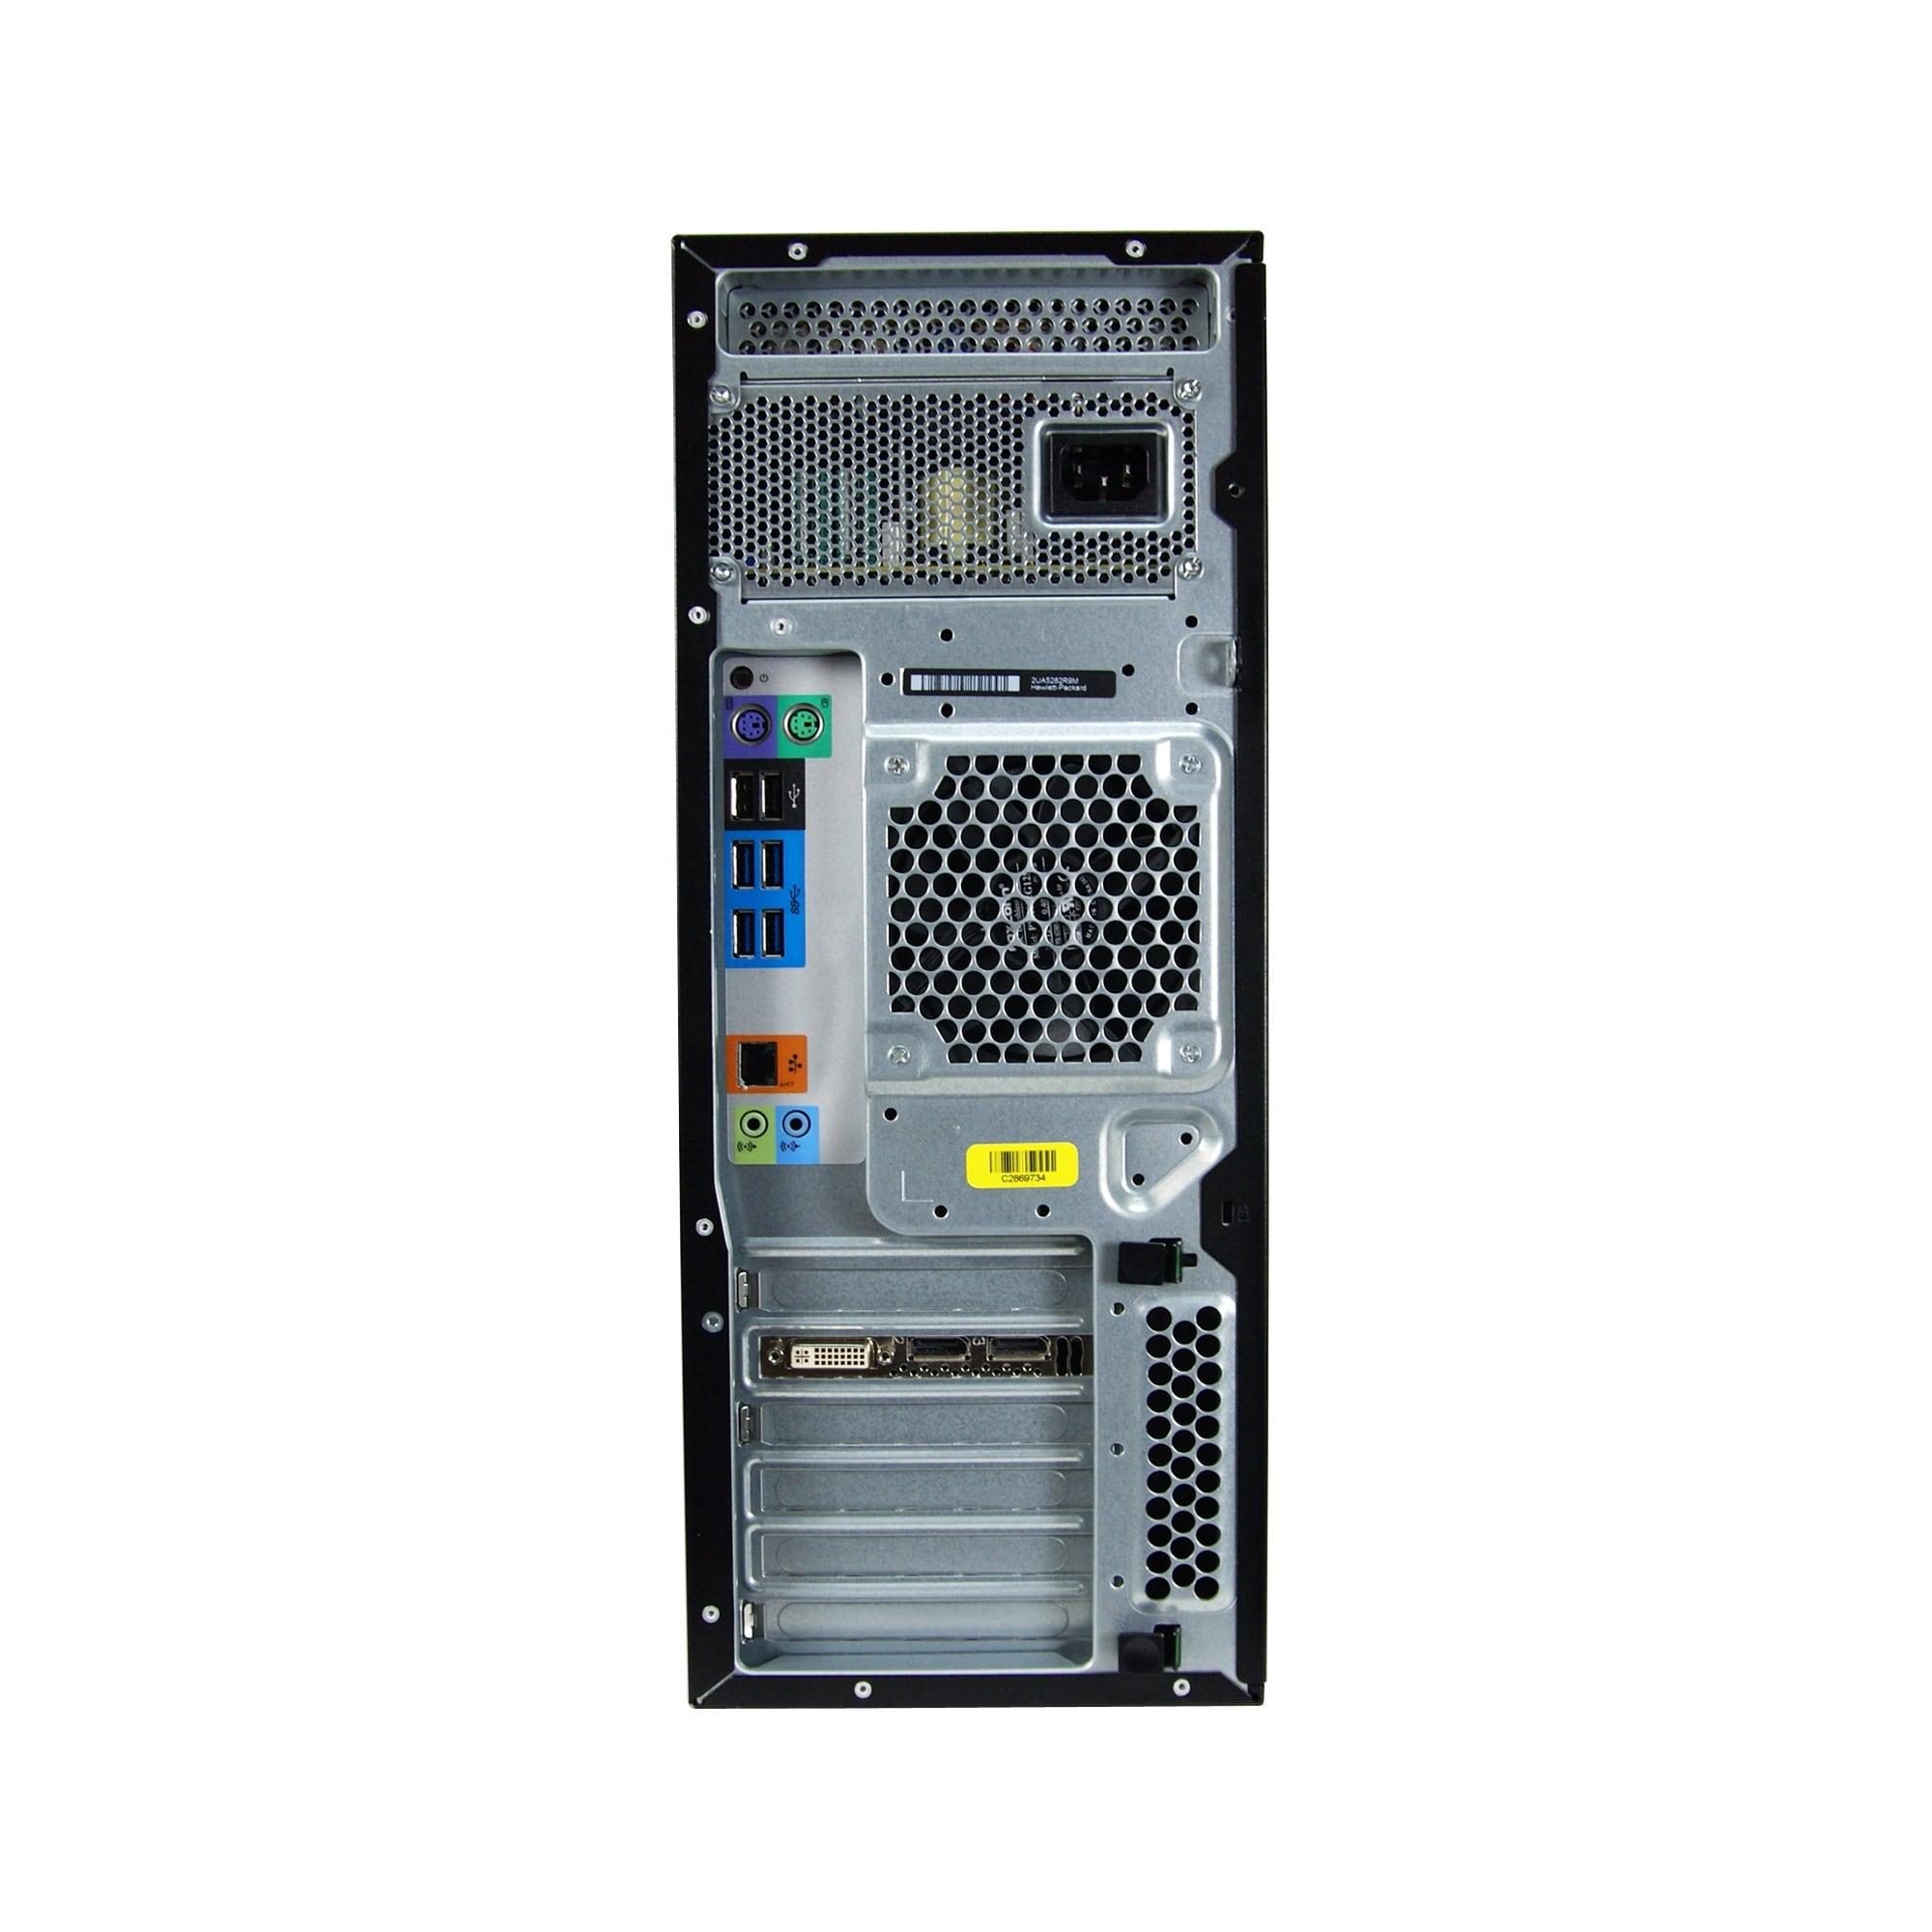 HP Z440 Intel Xeon E5-1620 V3 3 5GHz 32GB RAM 256GB SSD DVD-RW Win 10 Pro  Workstation PC (Refurbished)